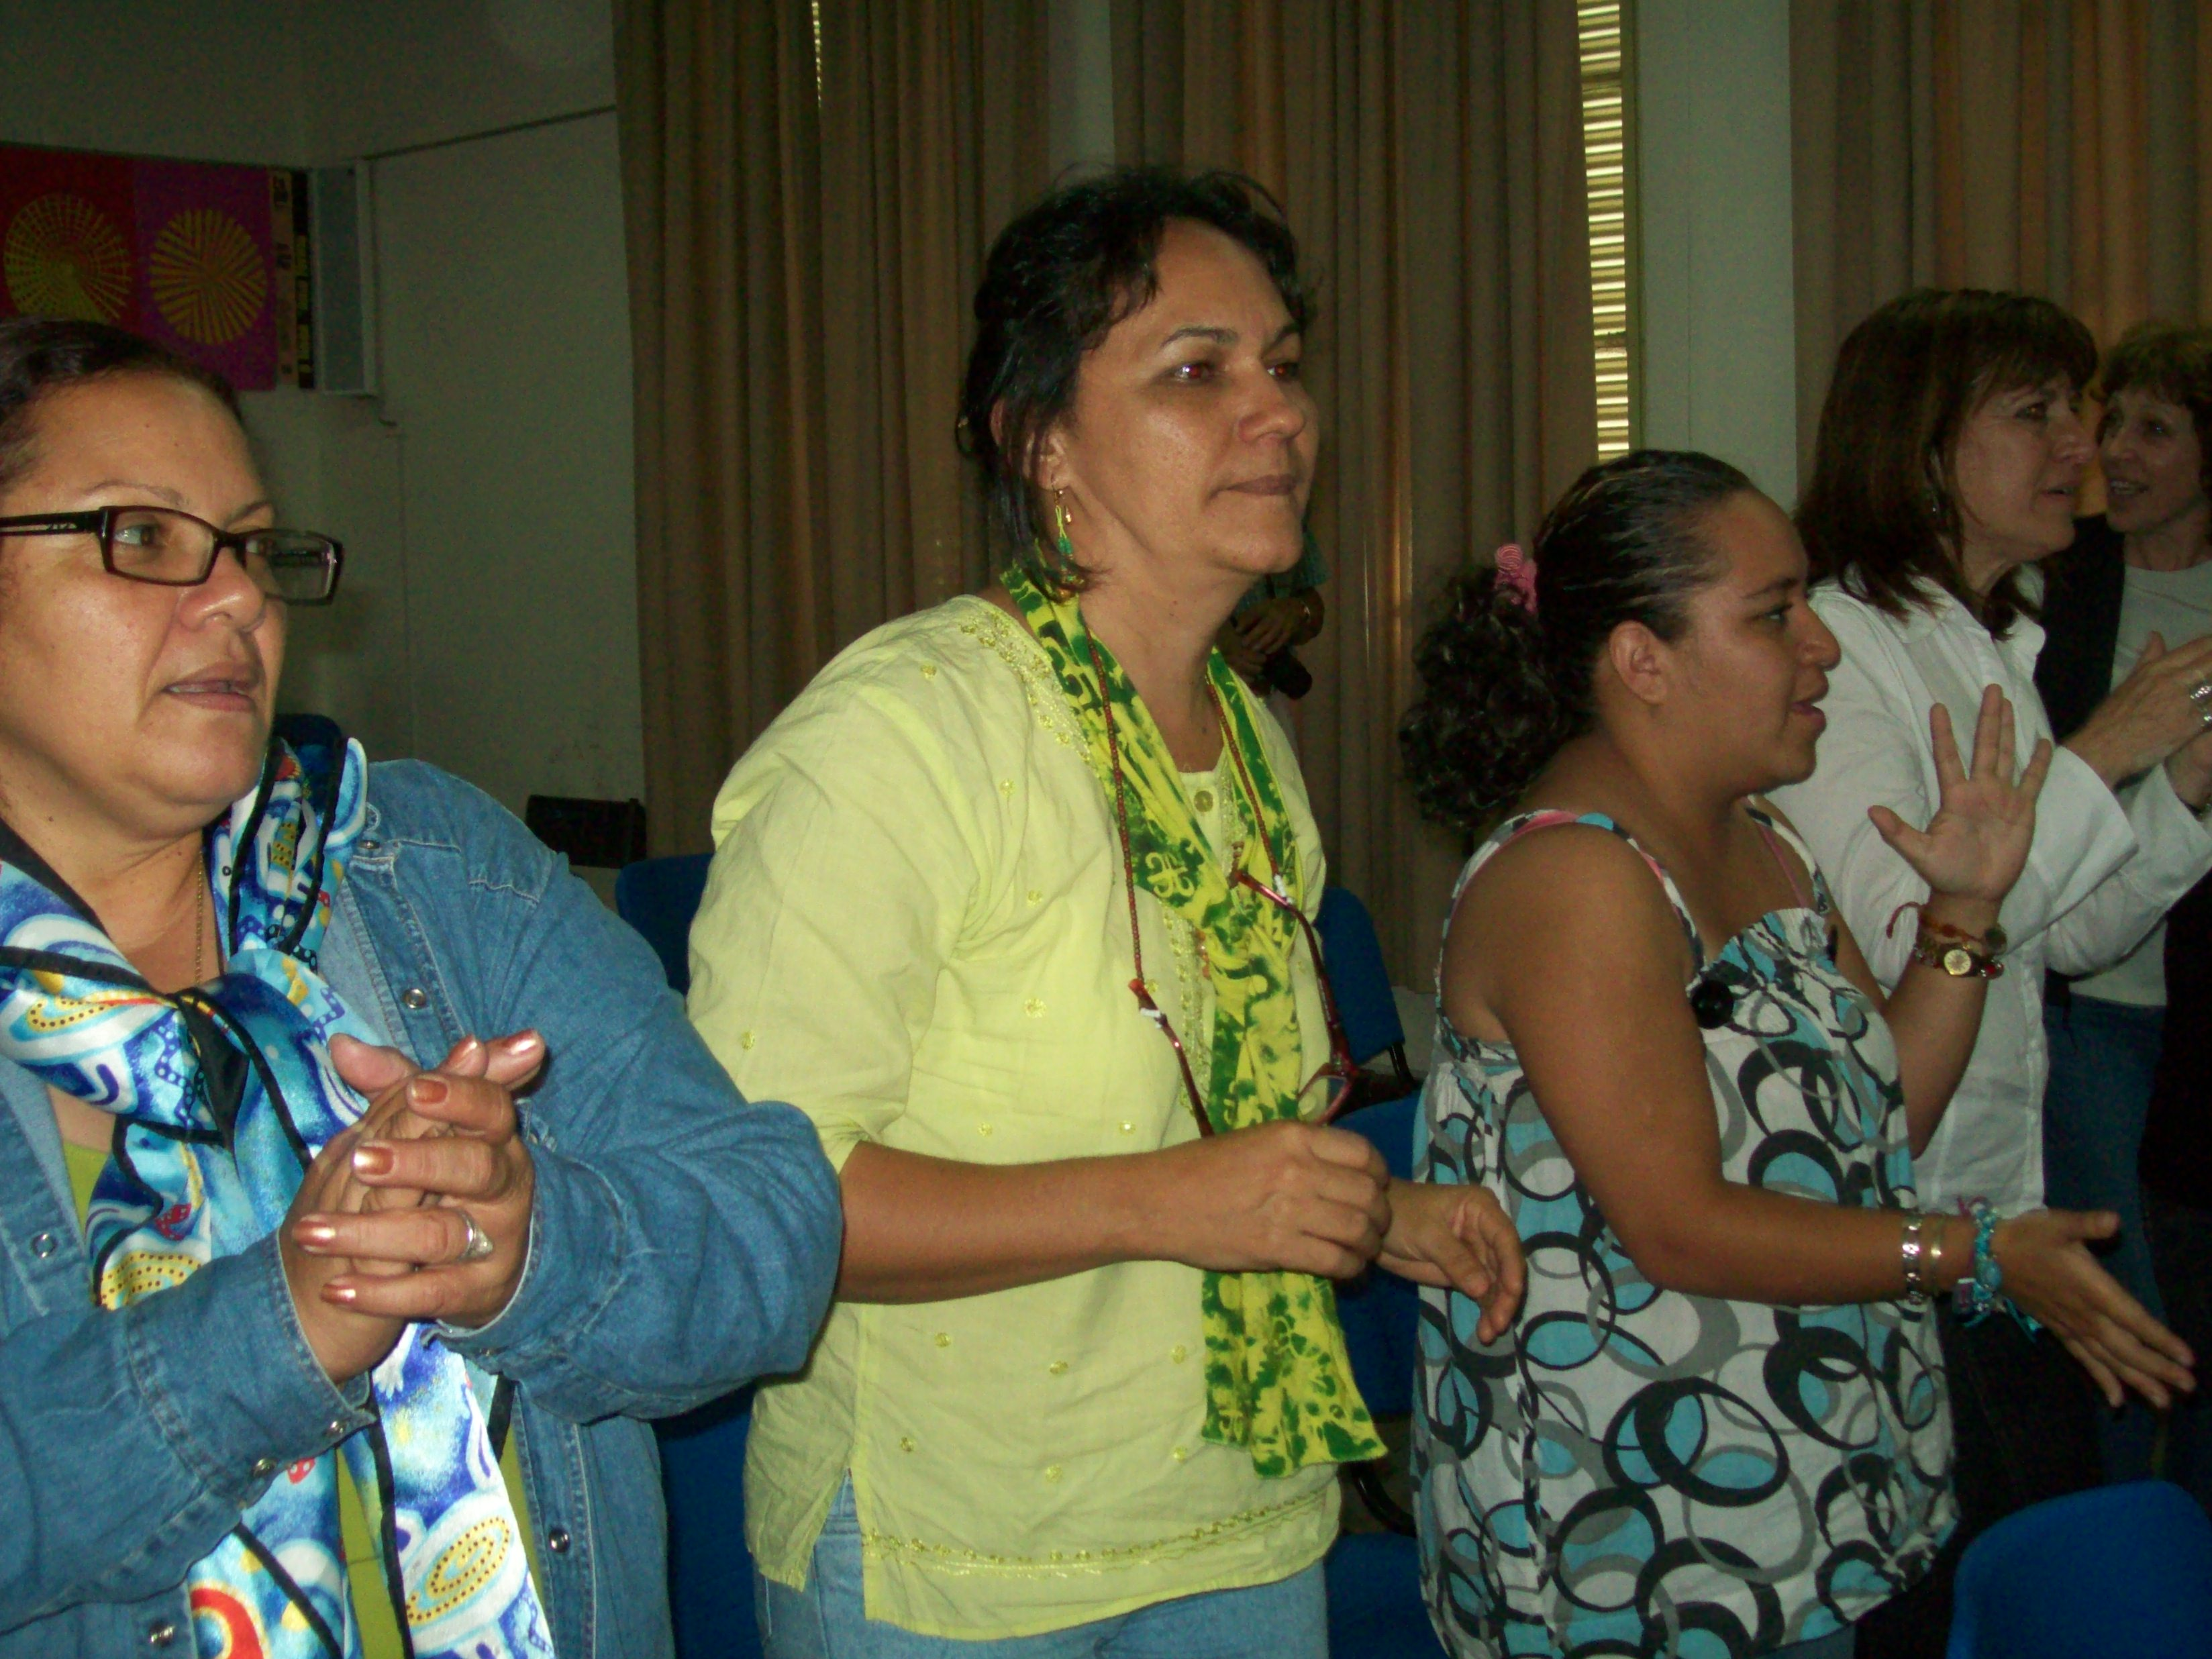 IV Encuentro - Santa fe 2009 (12)